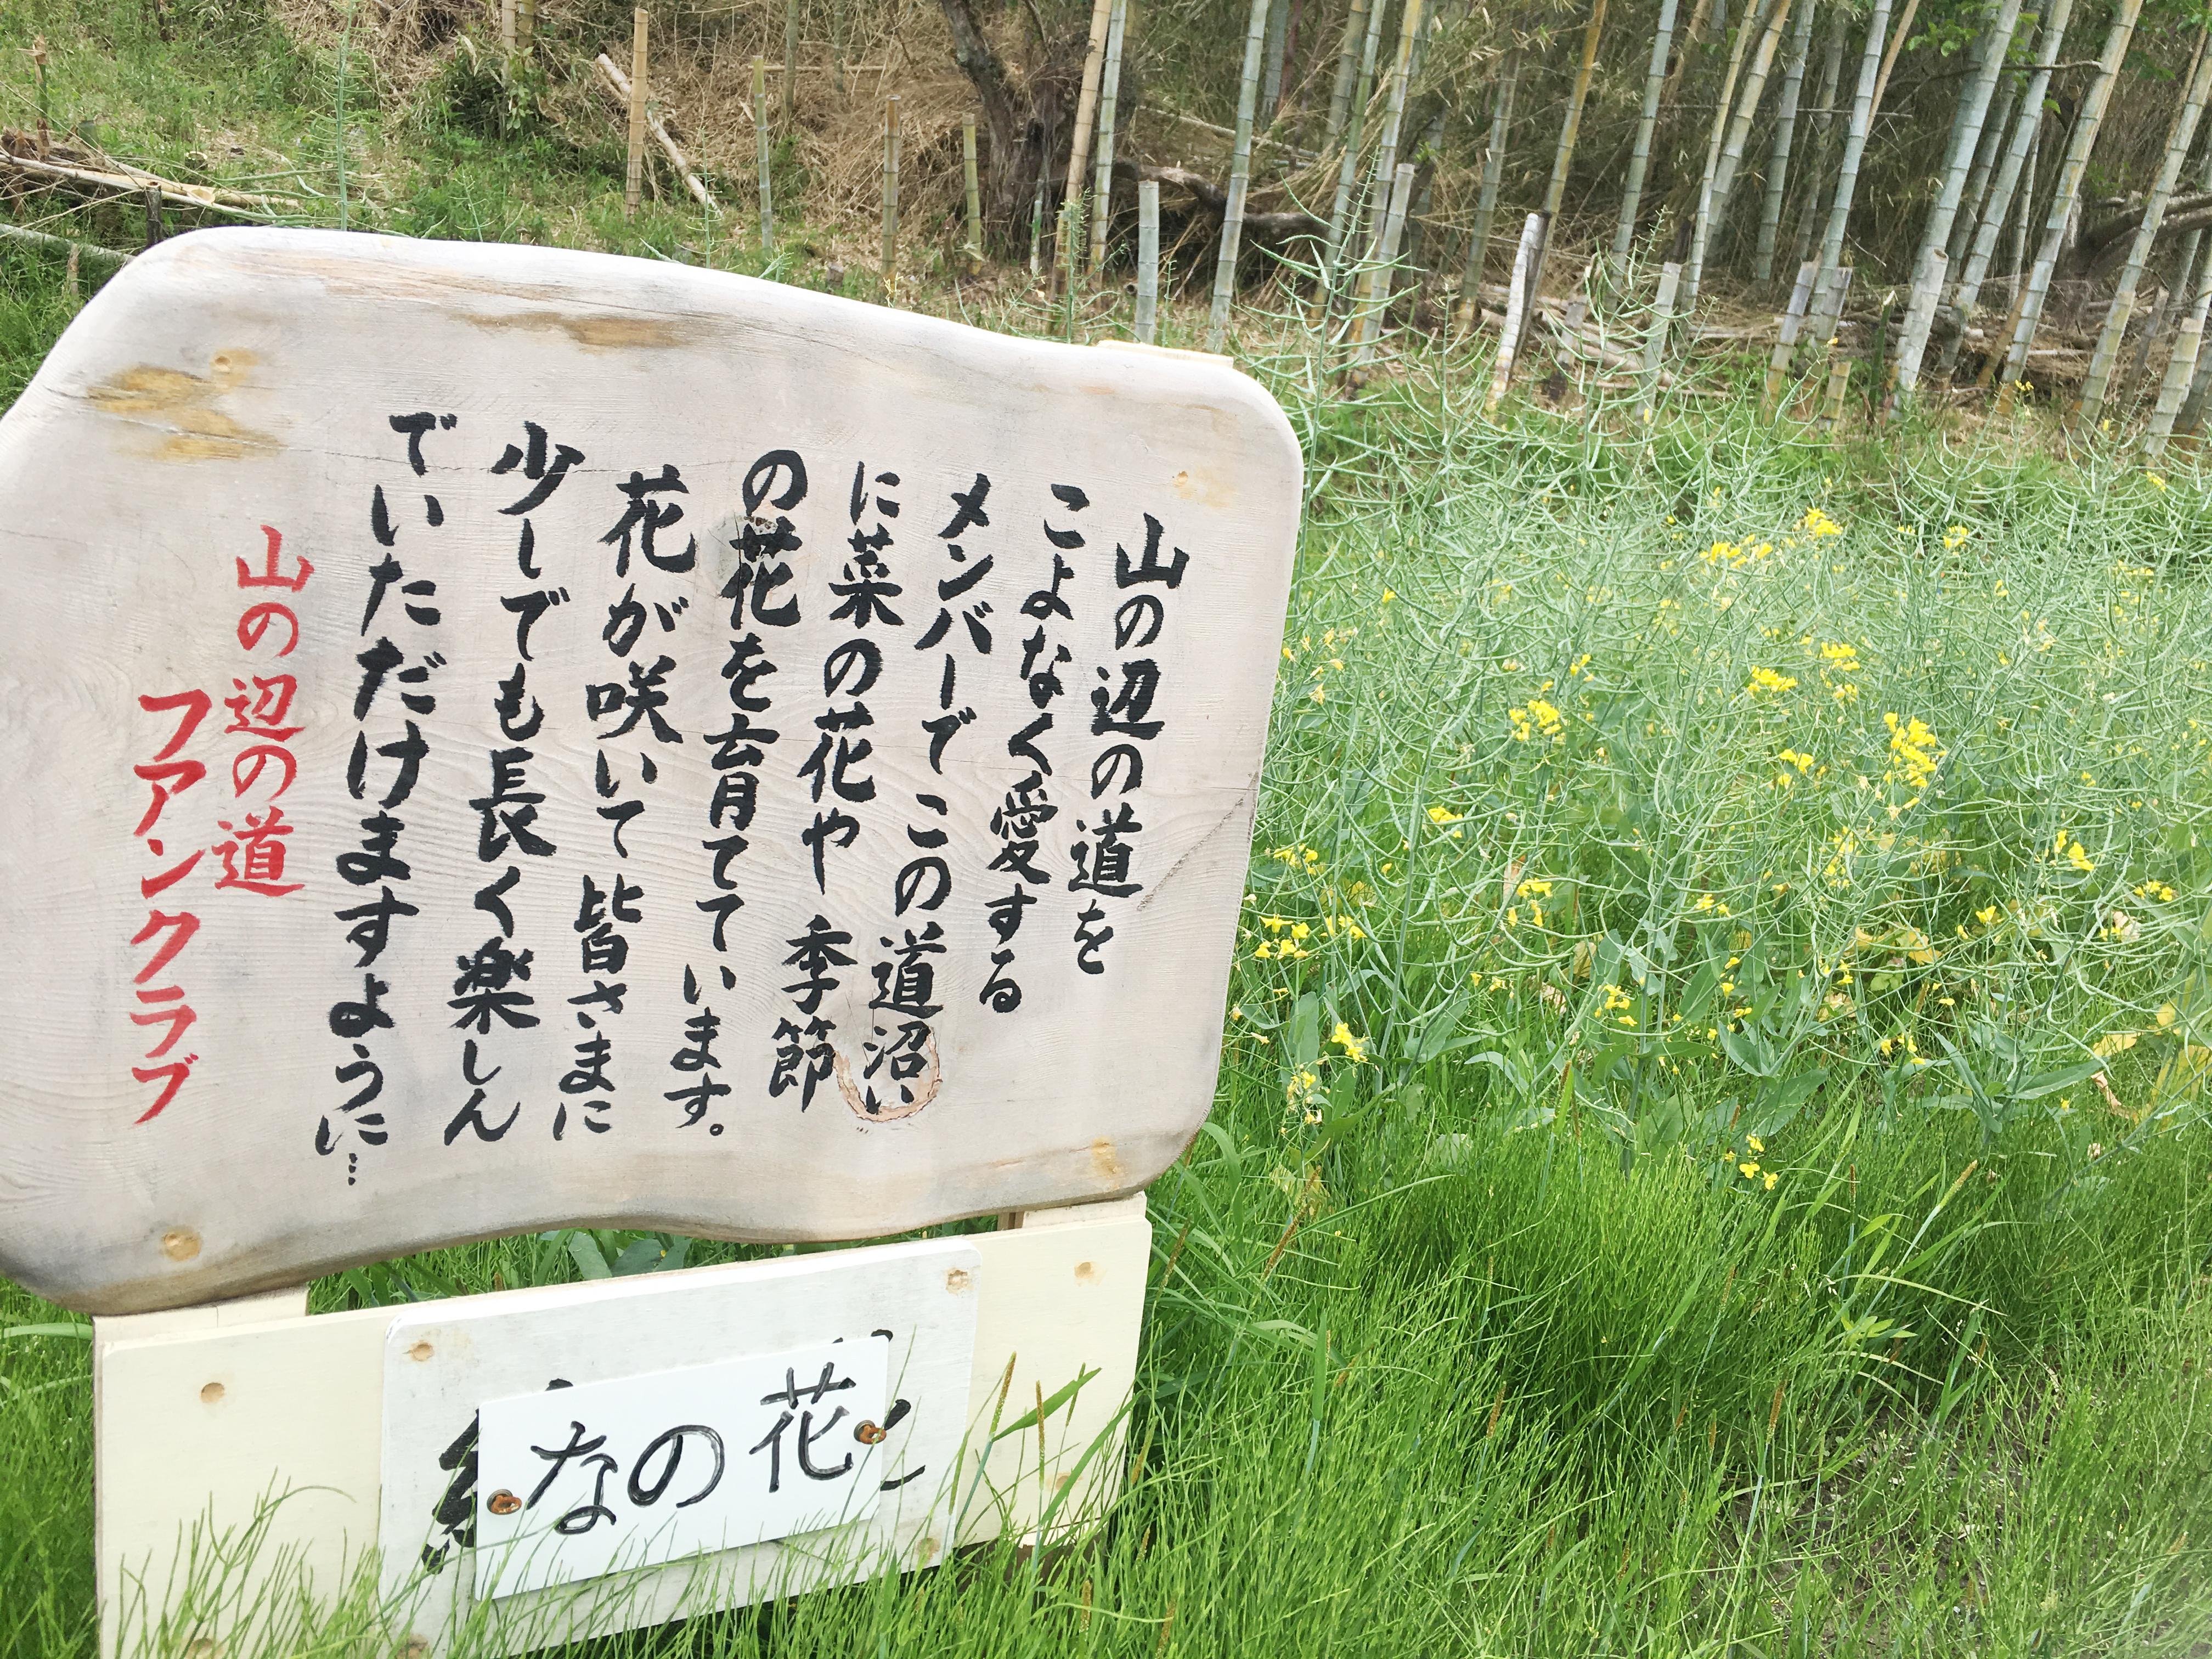 15nanohana - 日本最古の道 山野辺の道